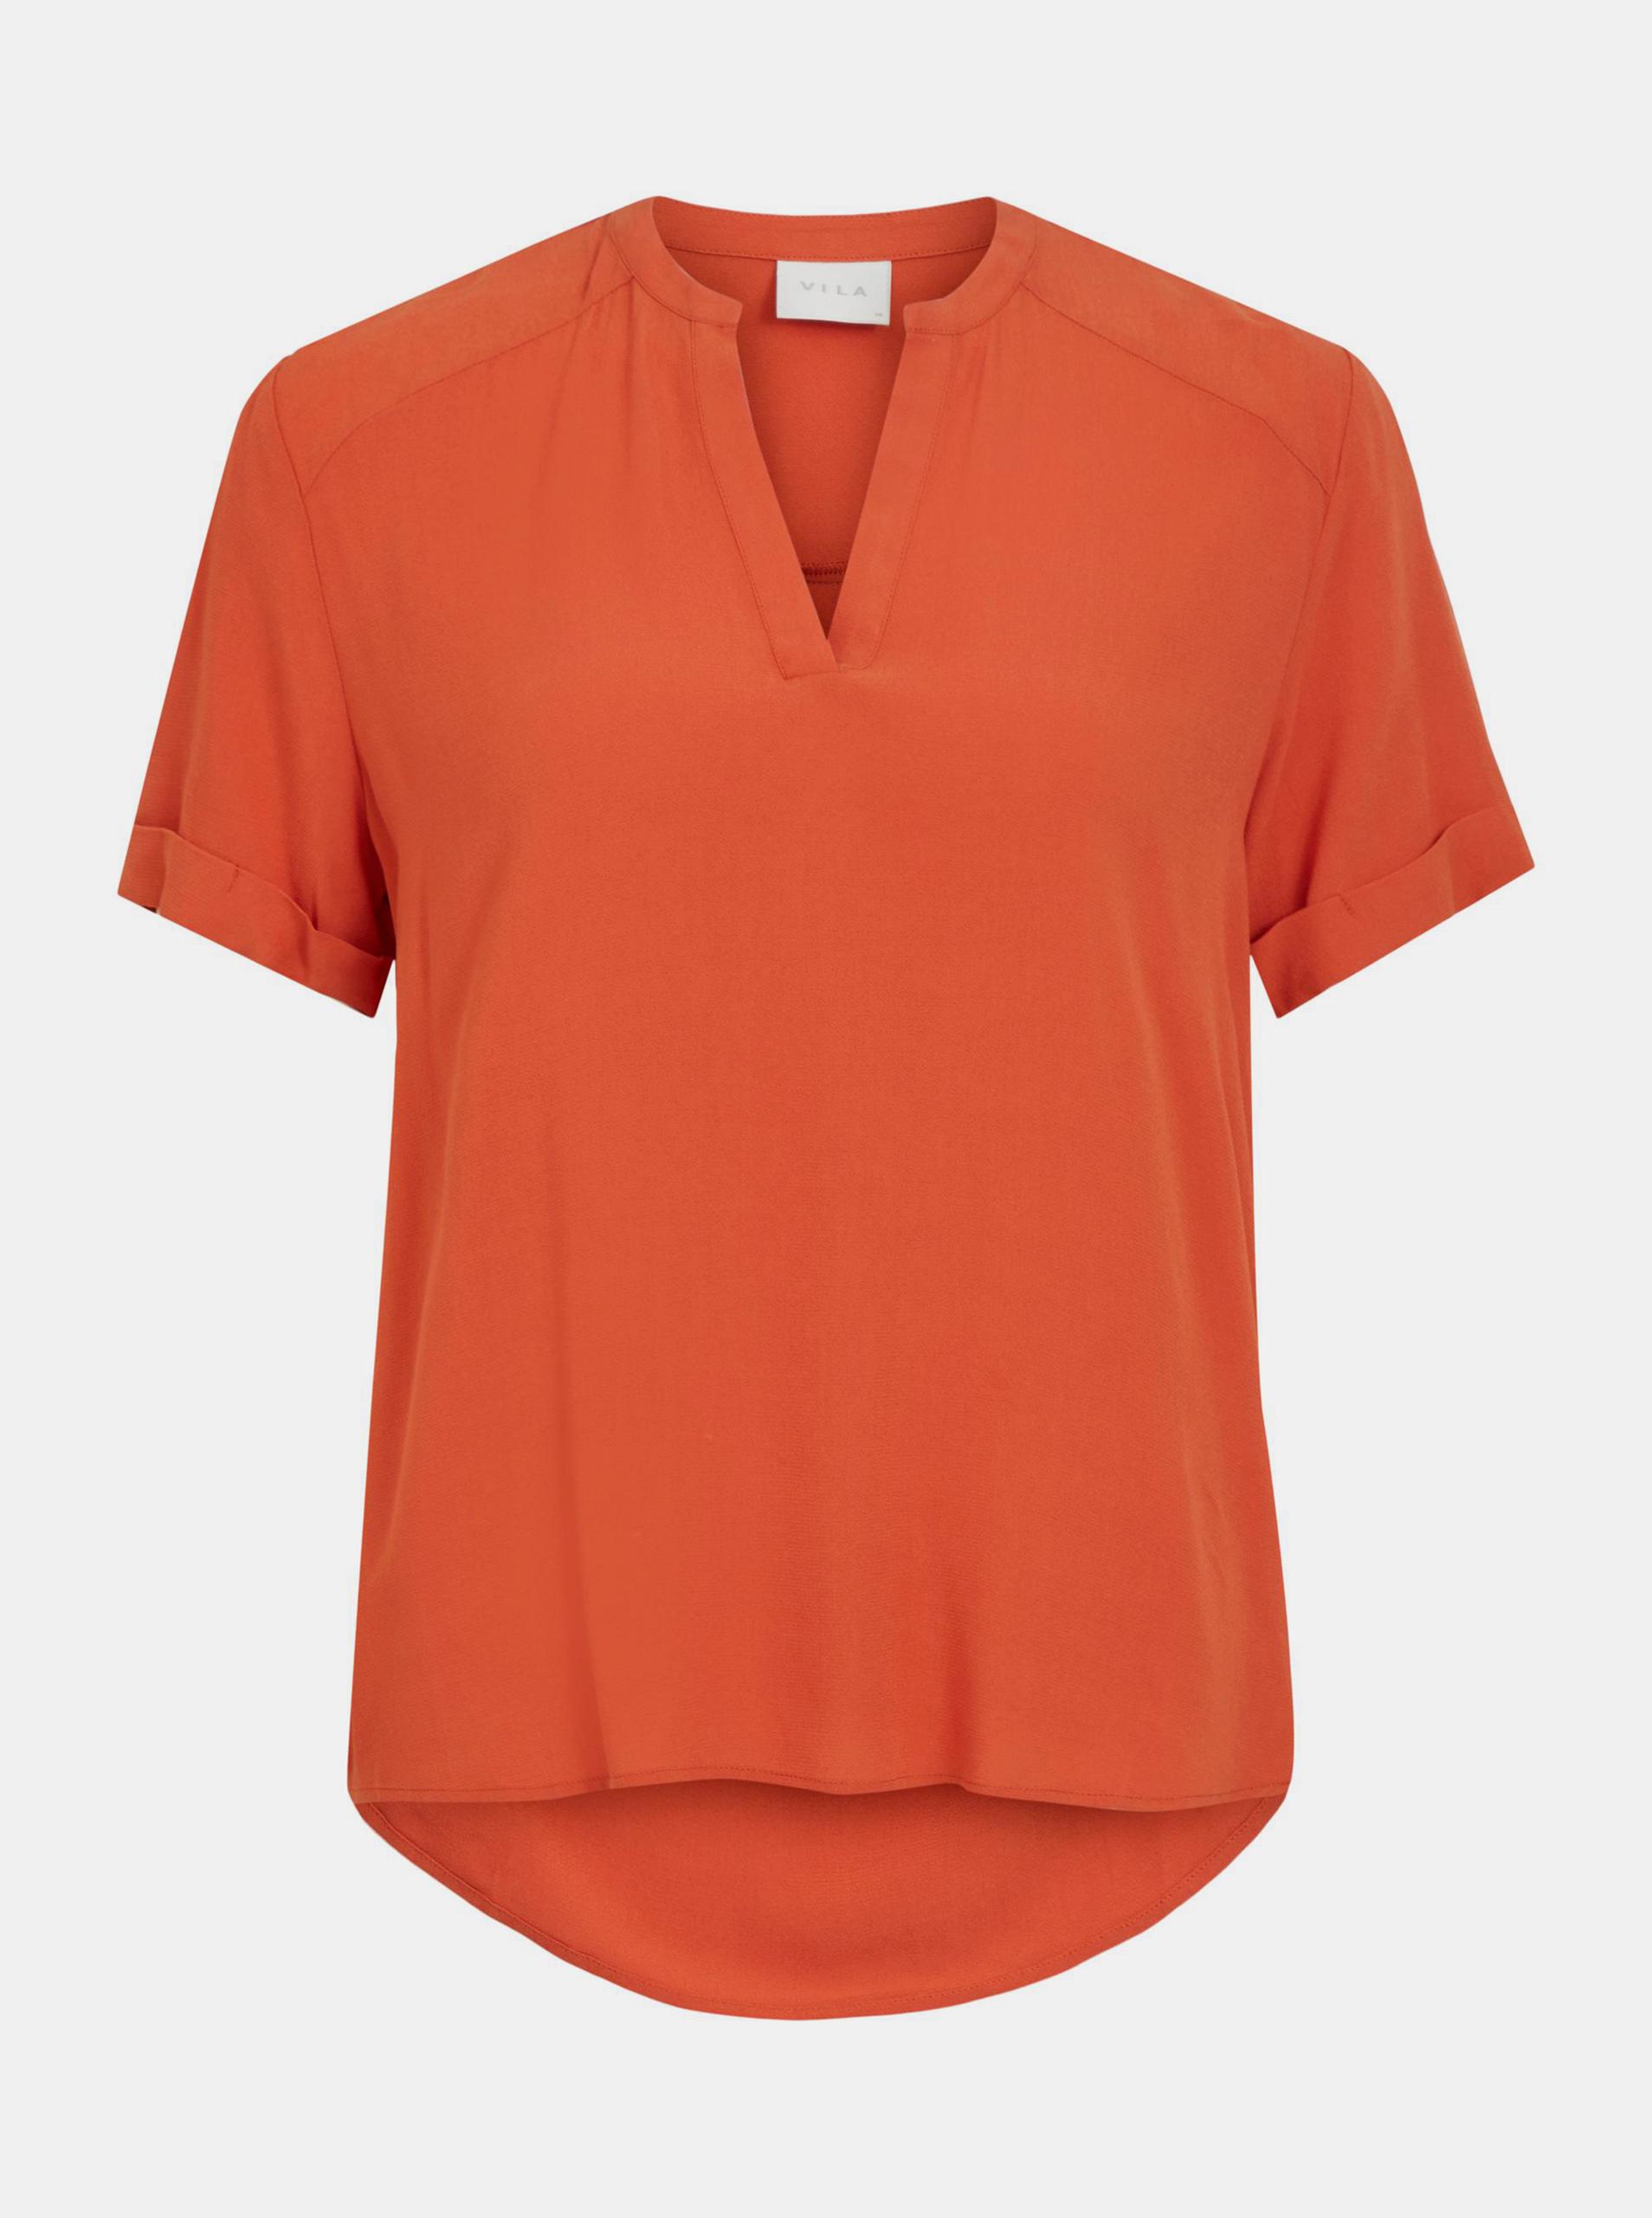 Vila orange blouse Ashly